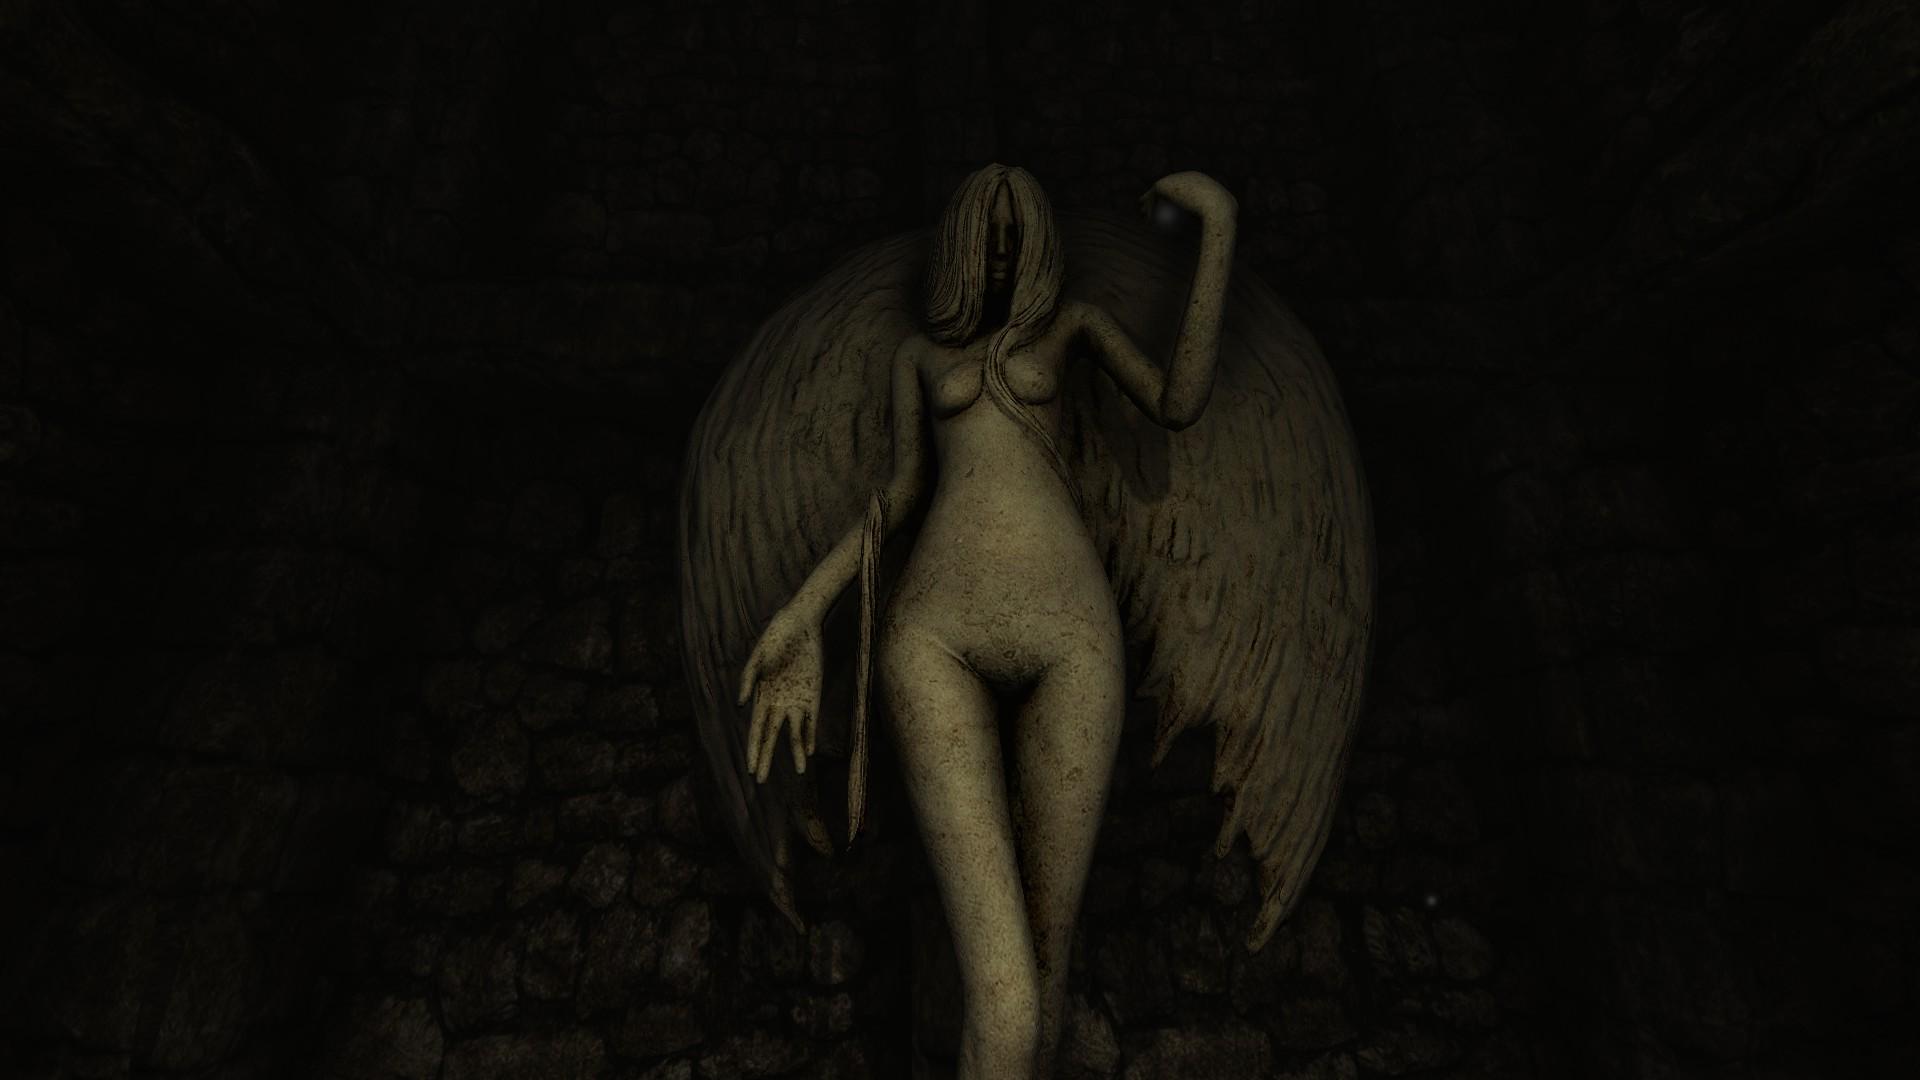 20180216211141_1.jpg - Amnesia: The Dark Descent